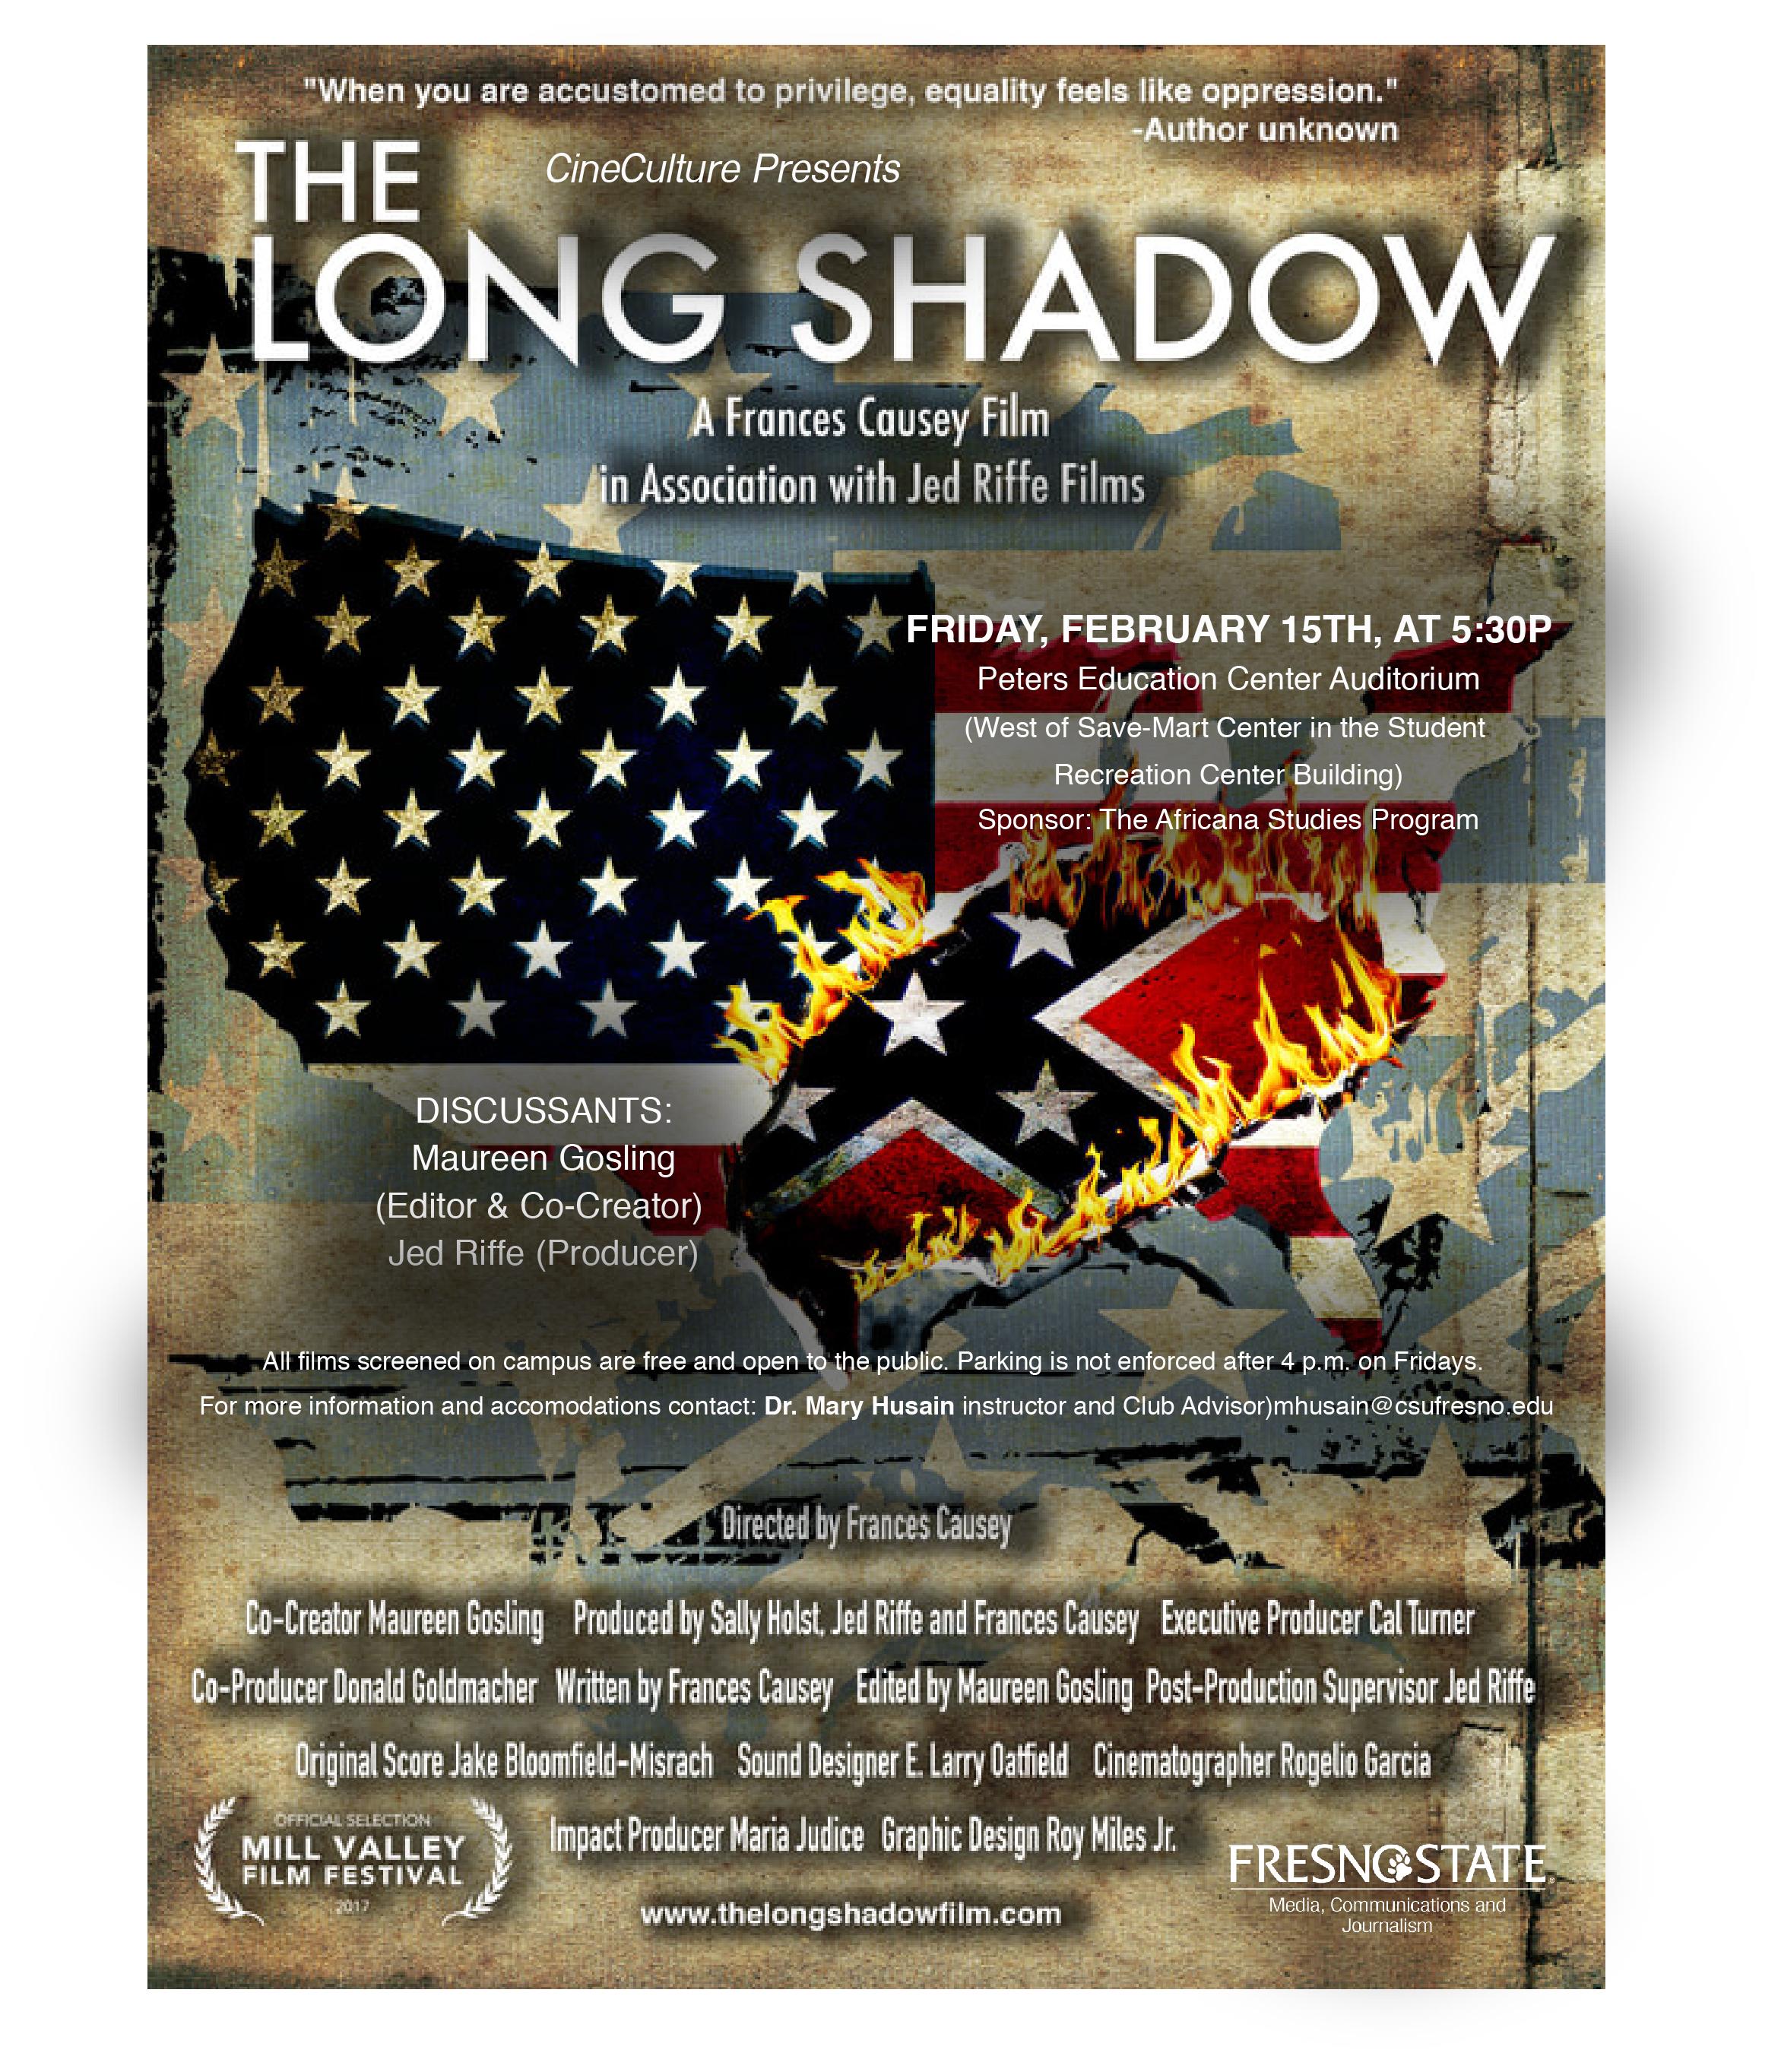 LongShadowPoster_COLOR